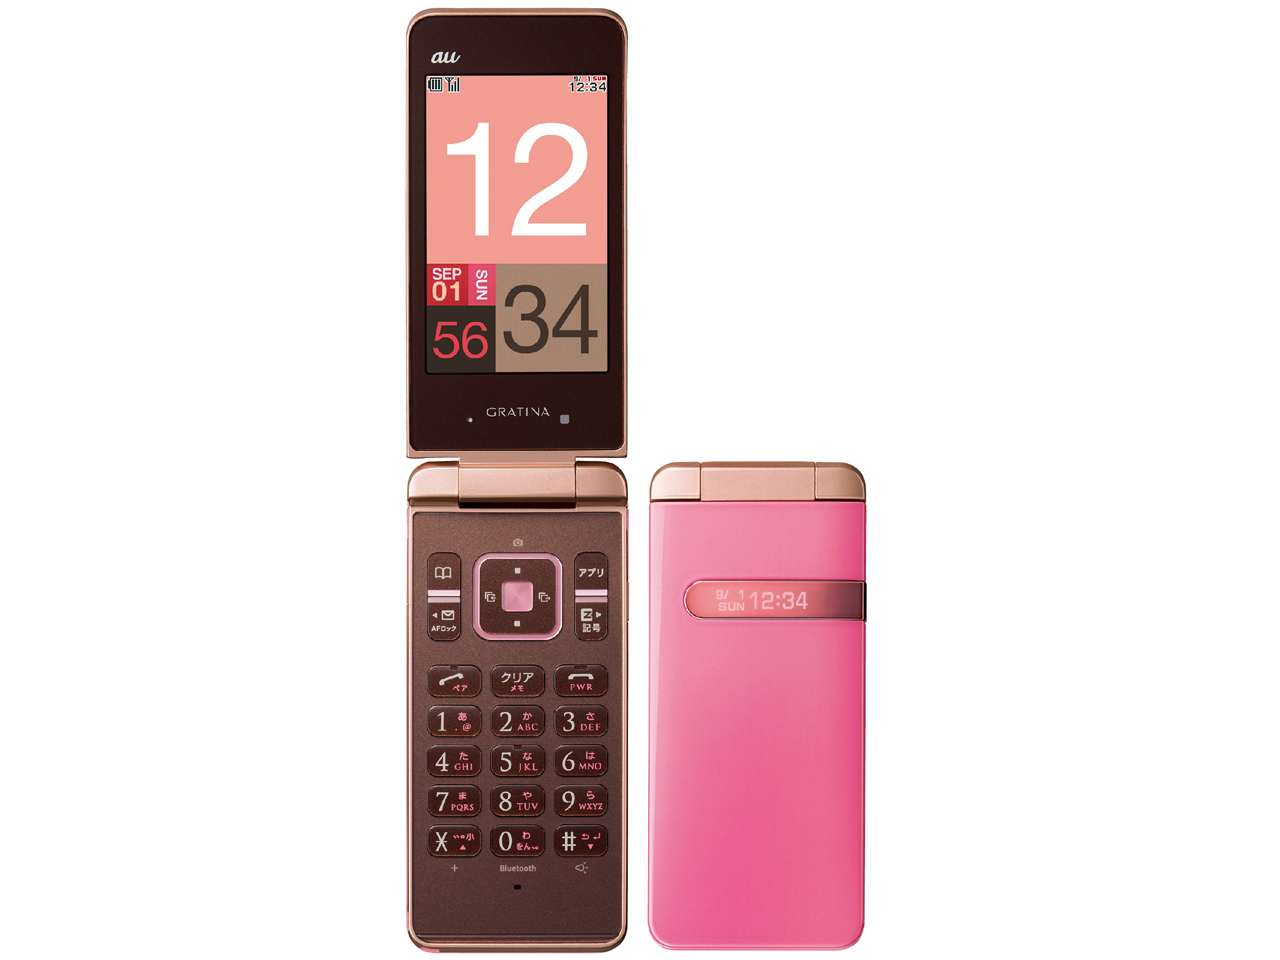 GRATINA KYY06 [ピンク] の製品画像